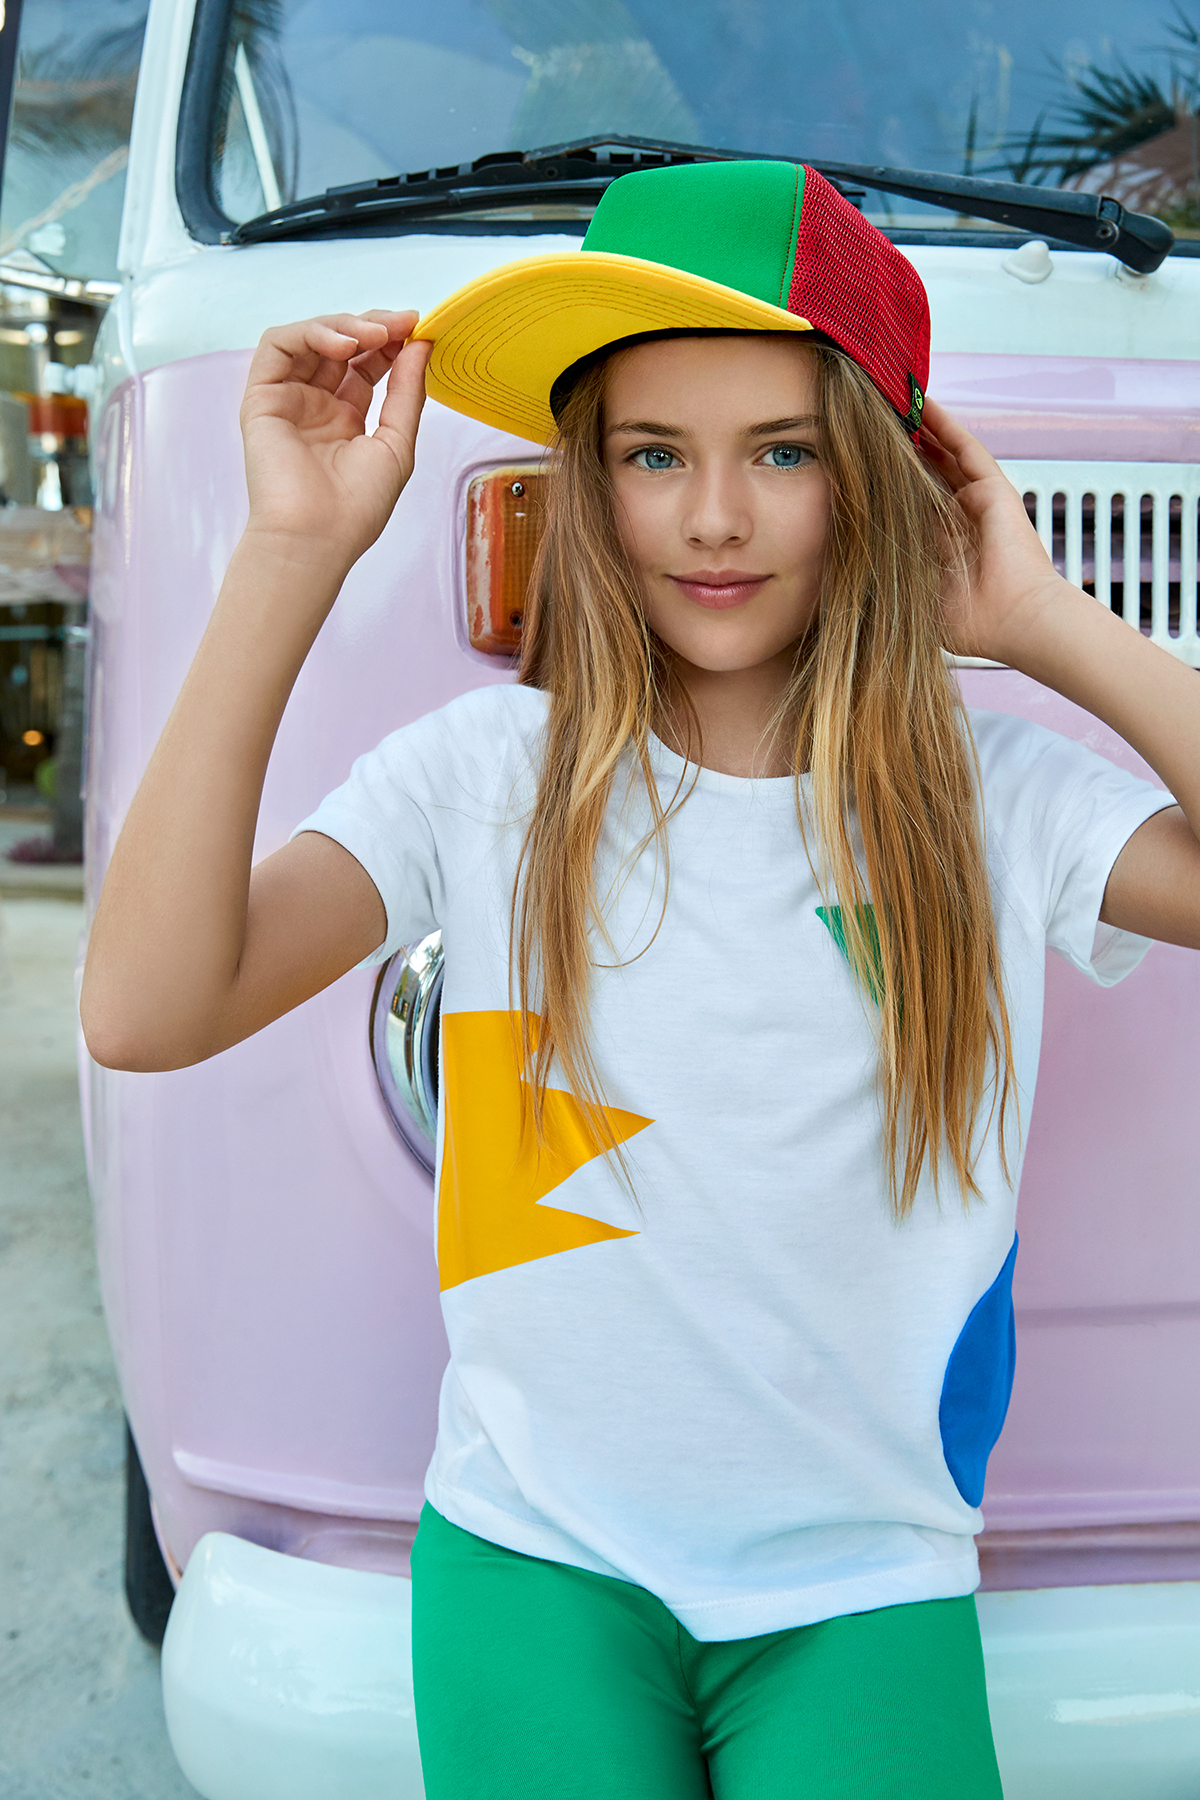 Kristina Alex Magazine Plushenko Pimenova And Instyle Behance On f76ybYg